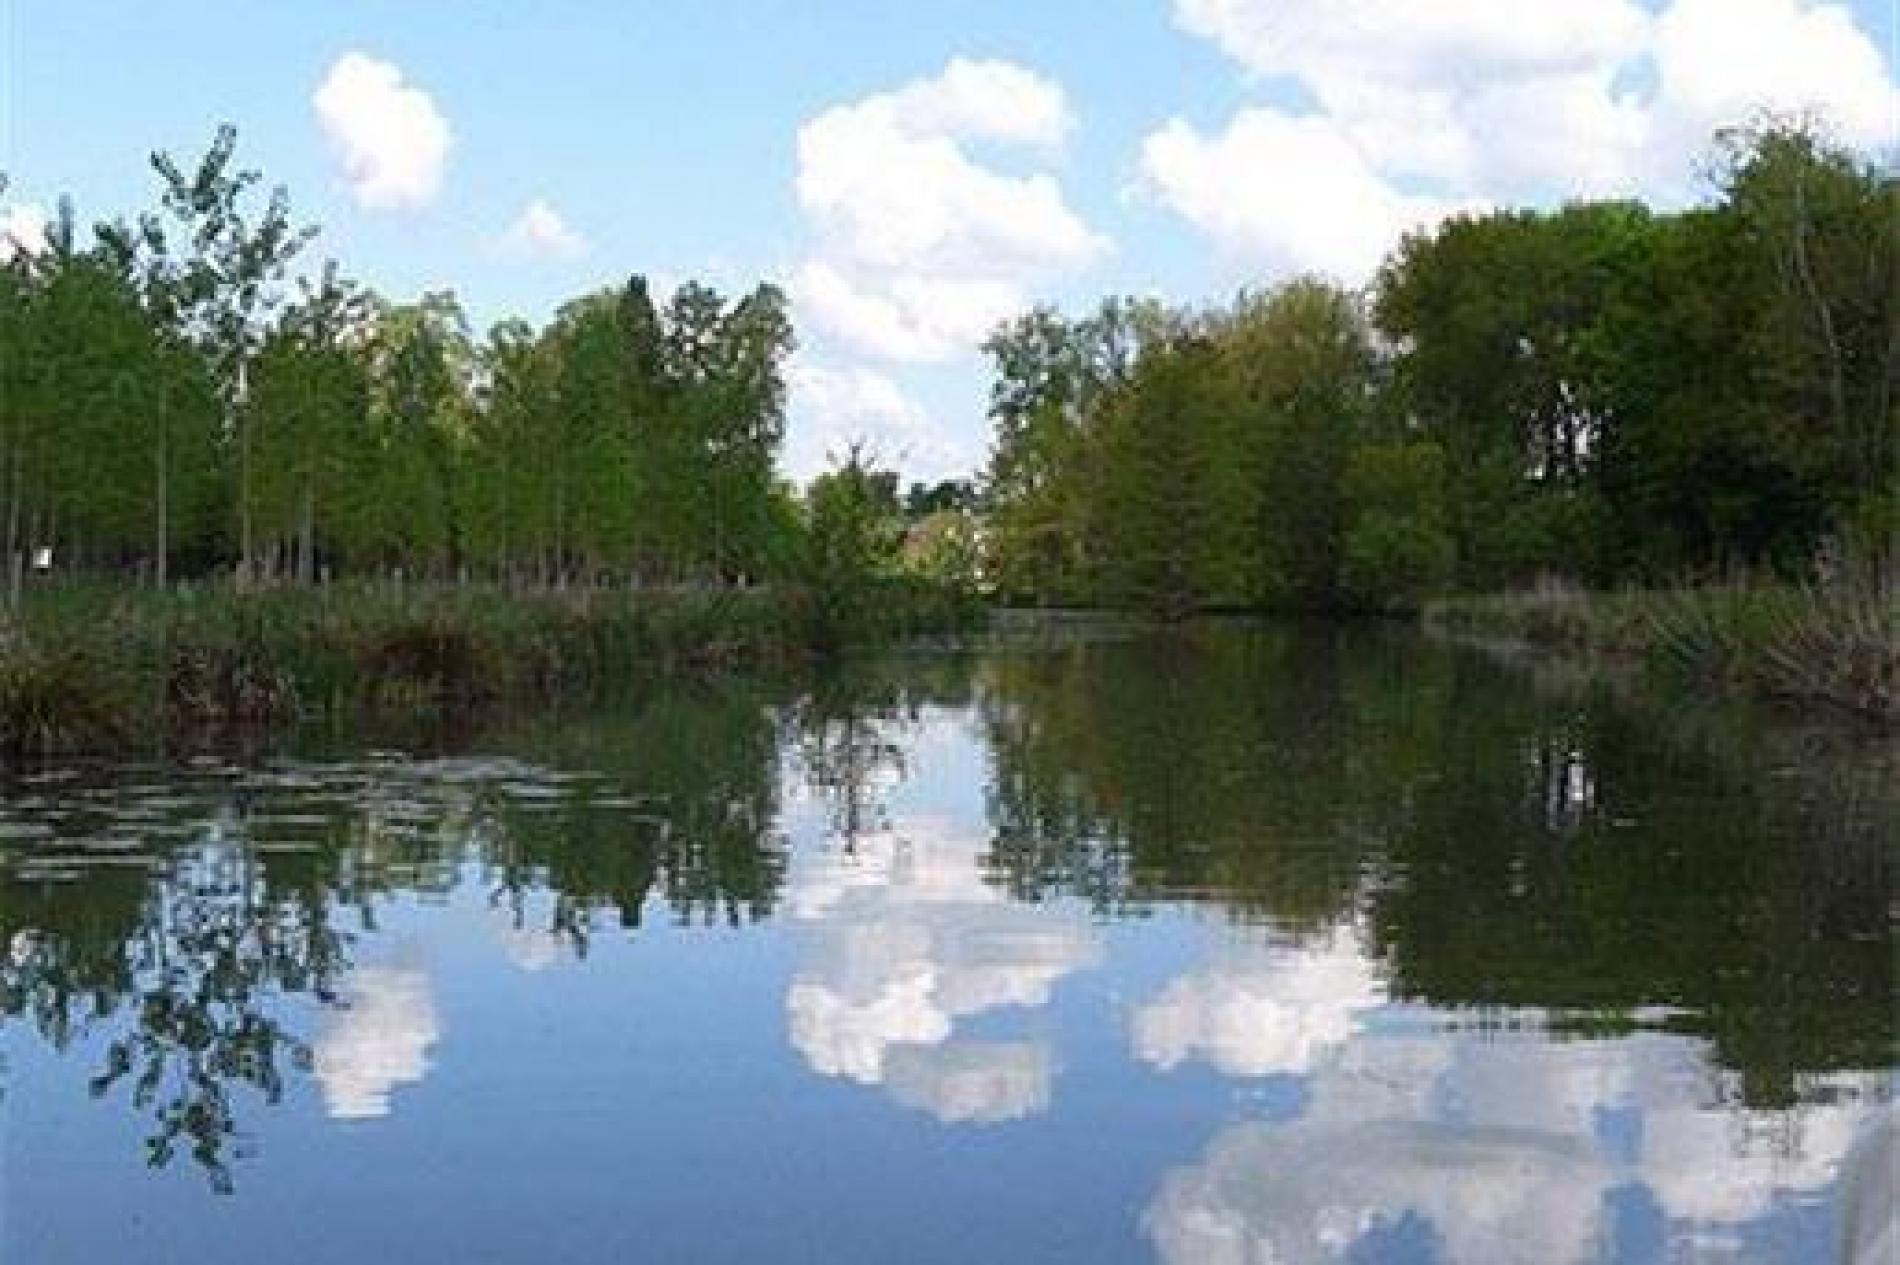 En barque sur le Loir